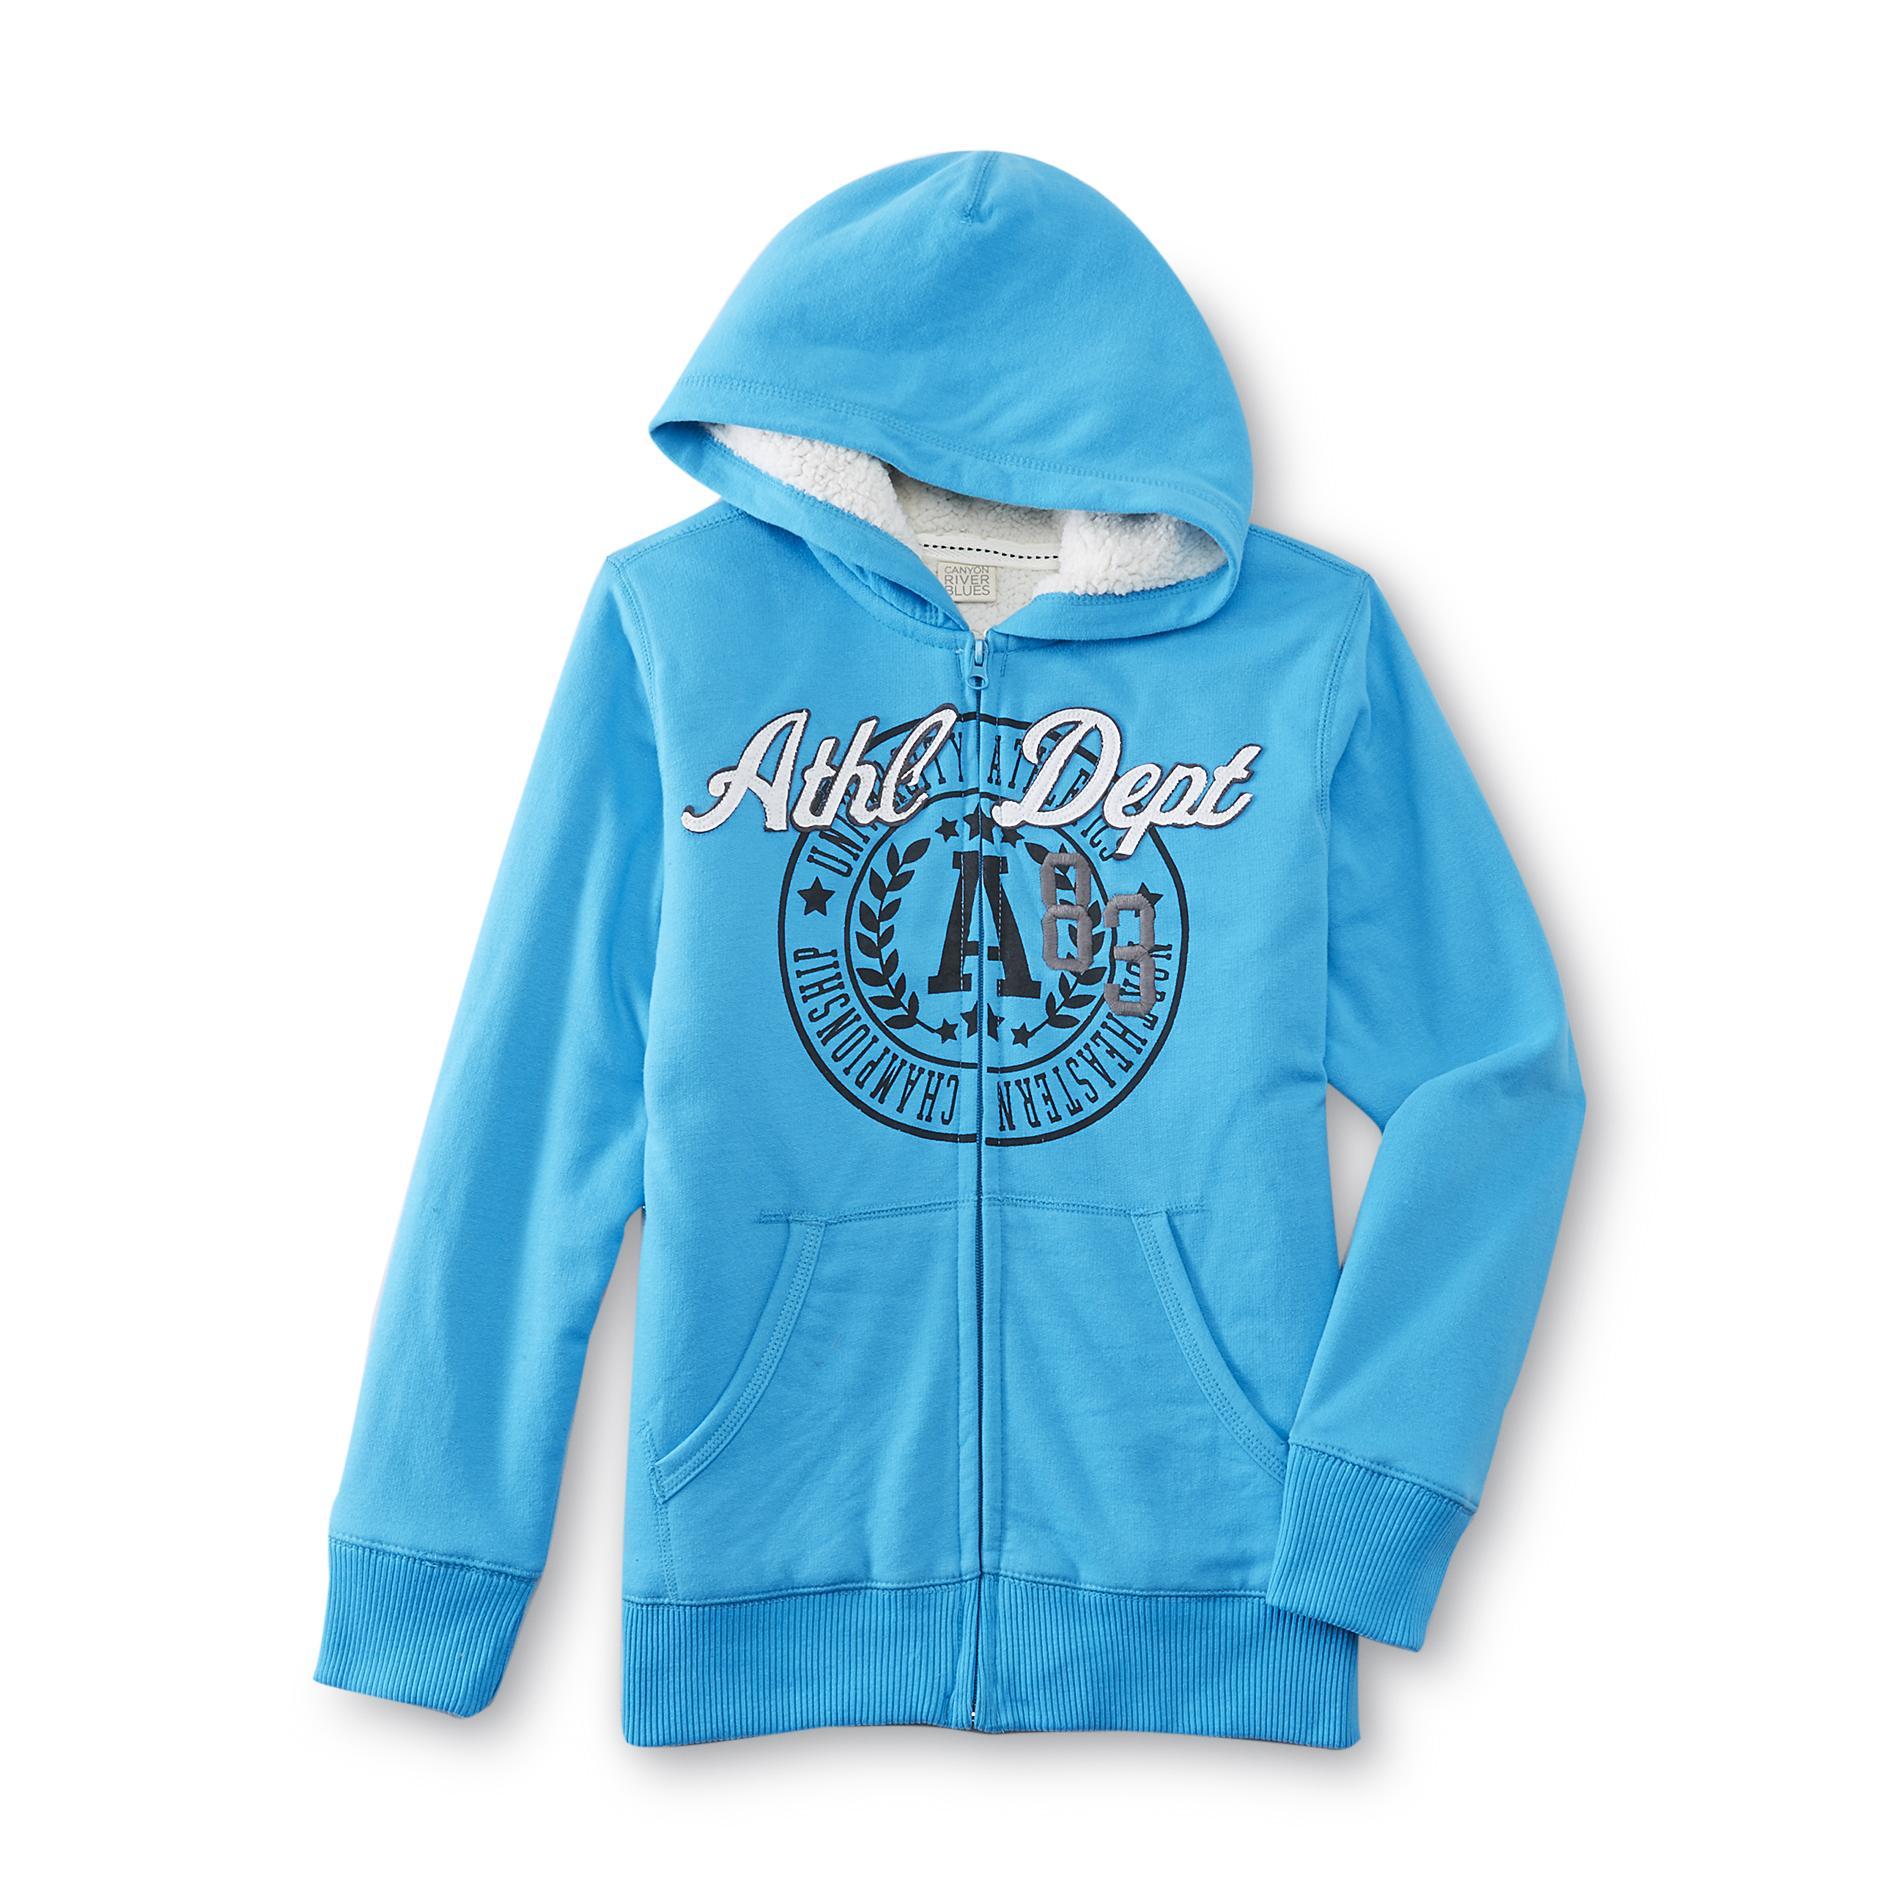 Boy's Fleece Hoodie Jacket - Athletic Department